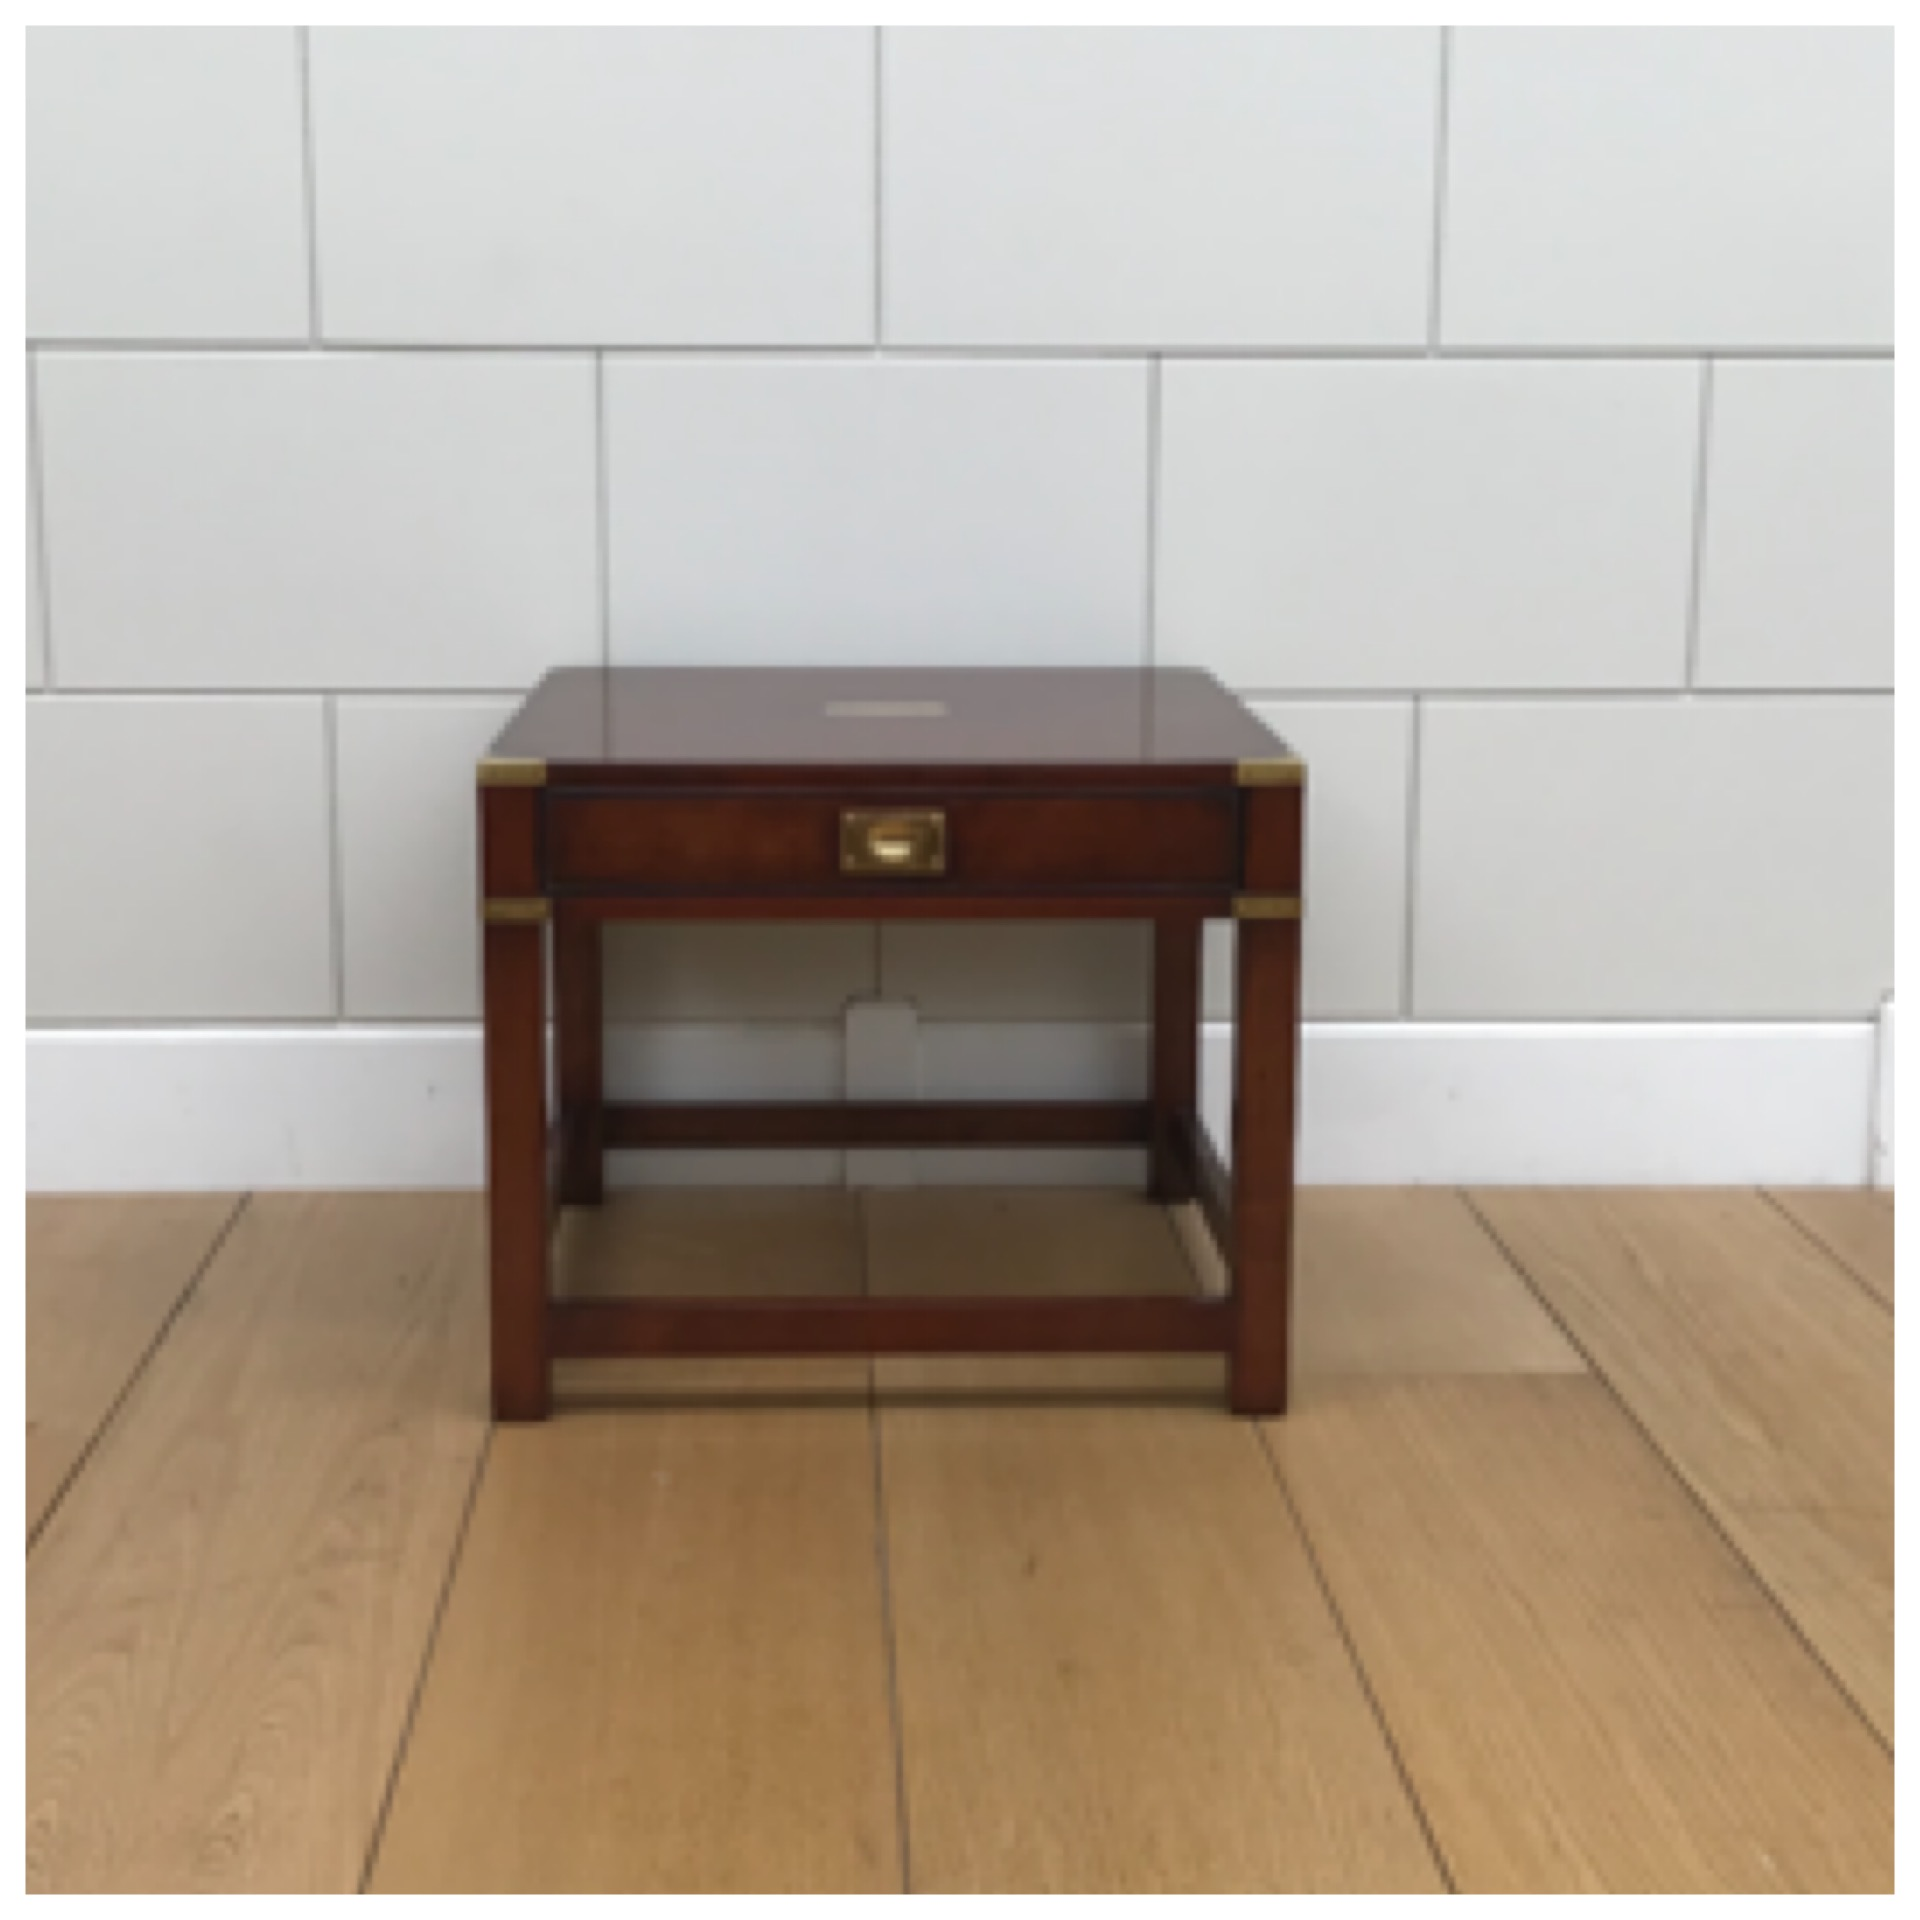 Sale Price: £420